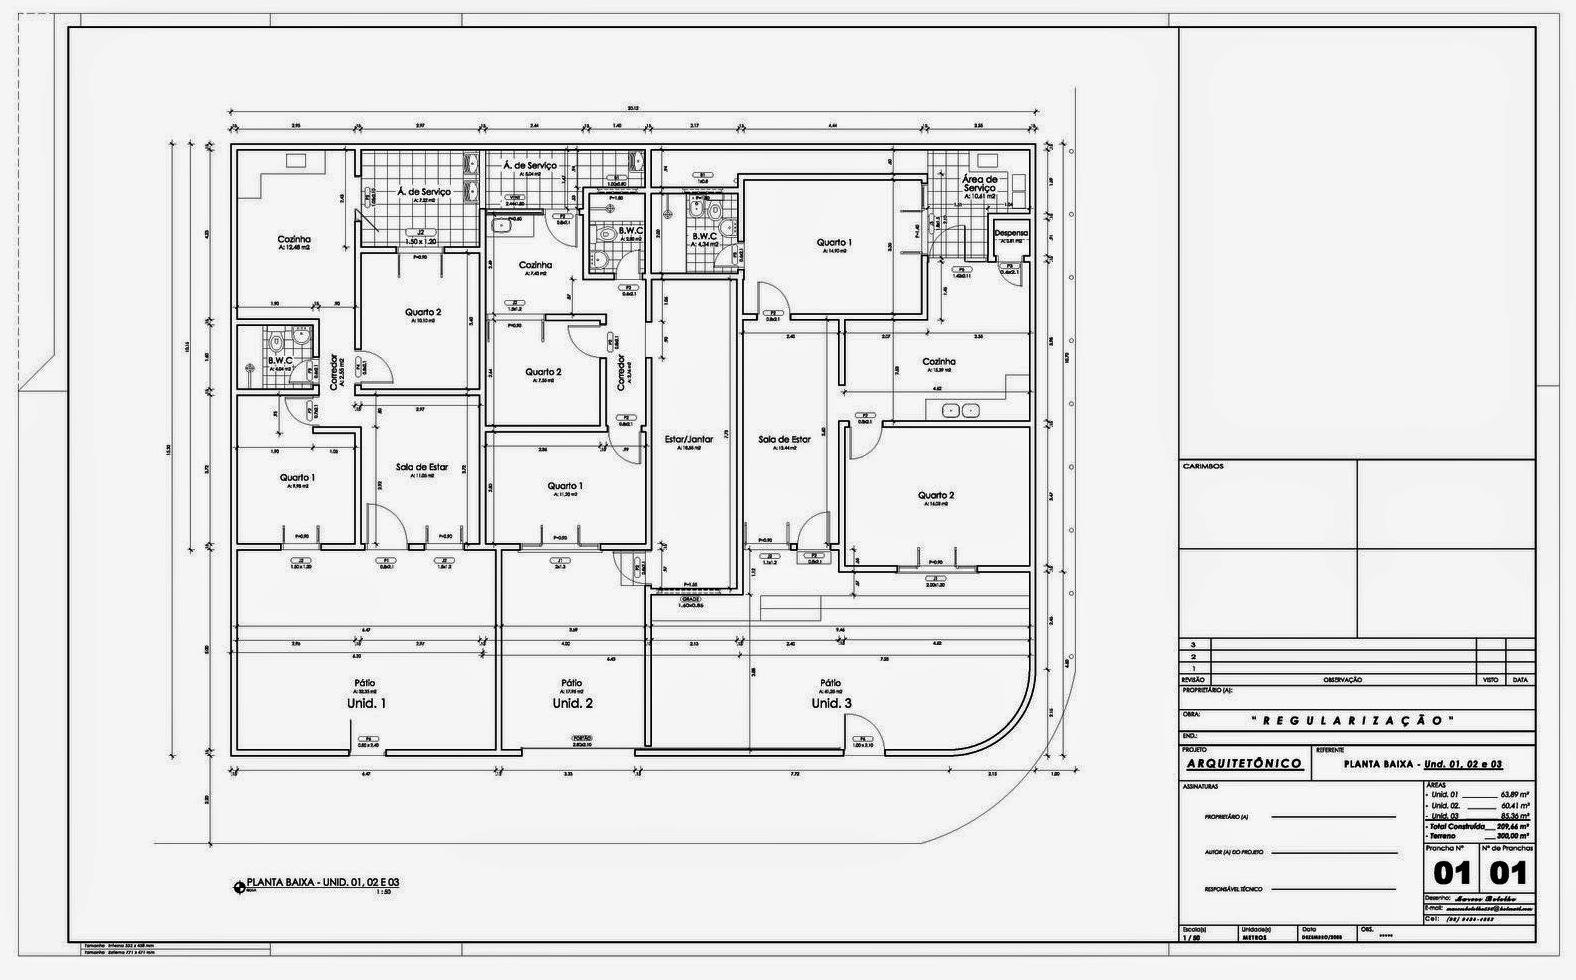 Projeto Residencial - Arquitetura (Multifamiliar)